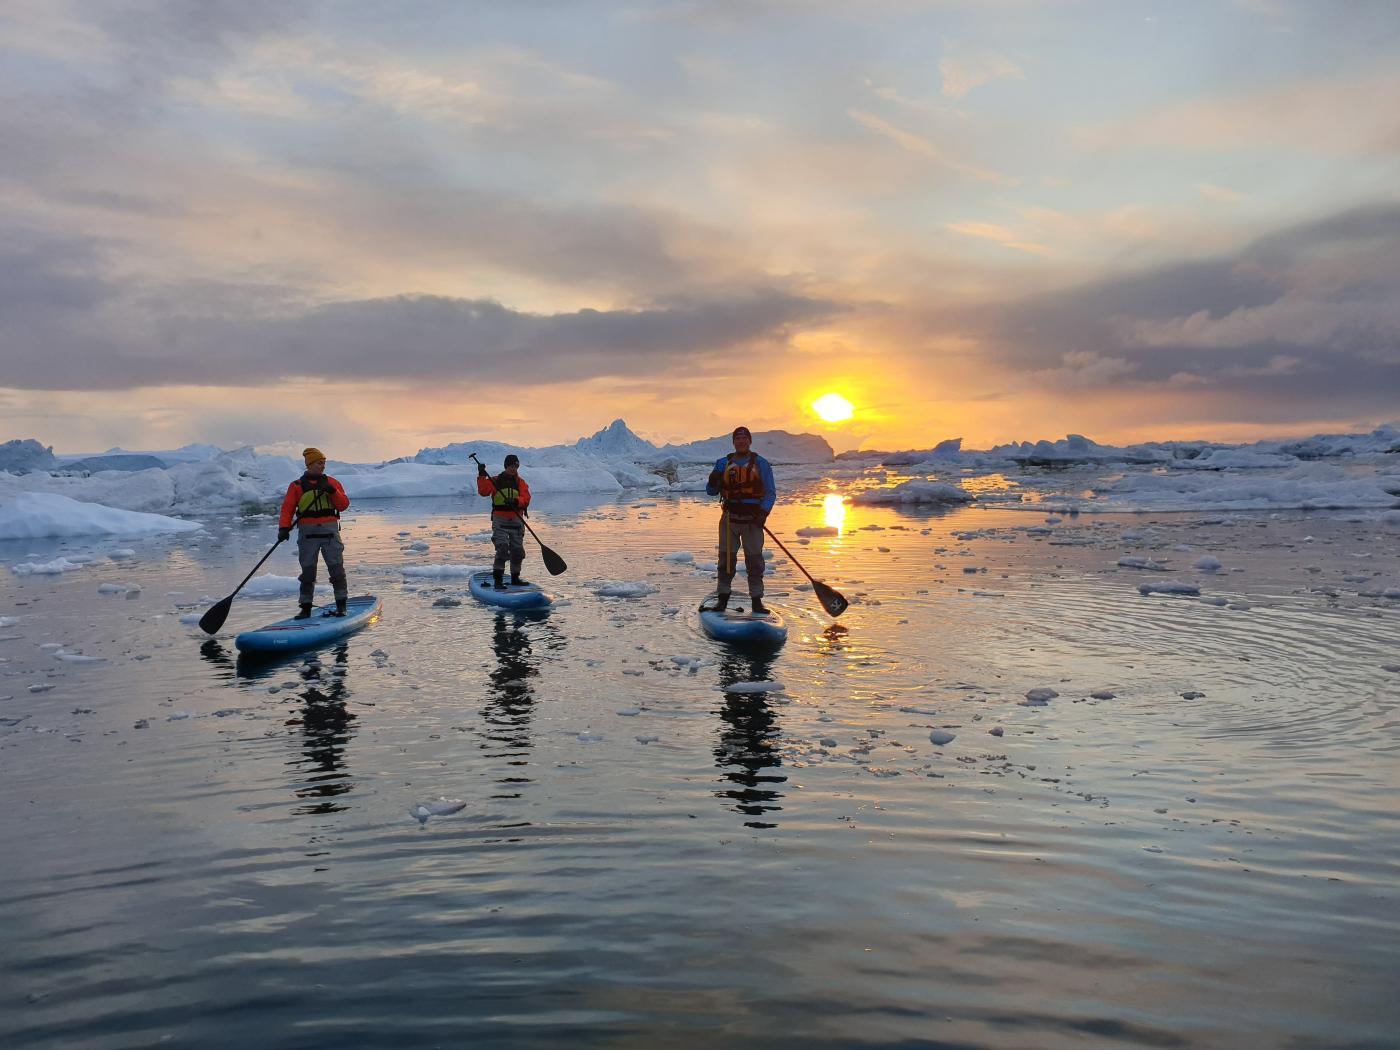 SUP. Photo by Ilulissat Adventure